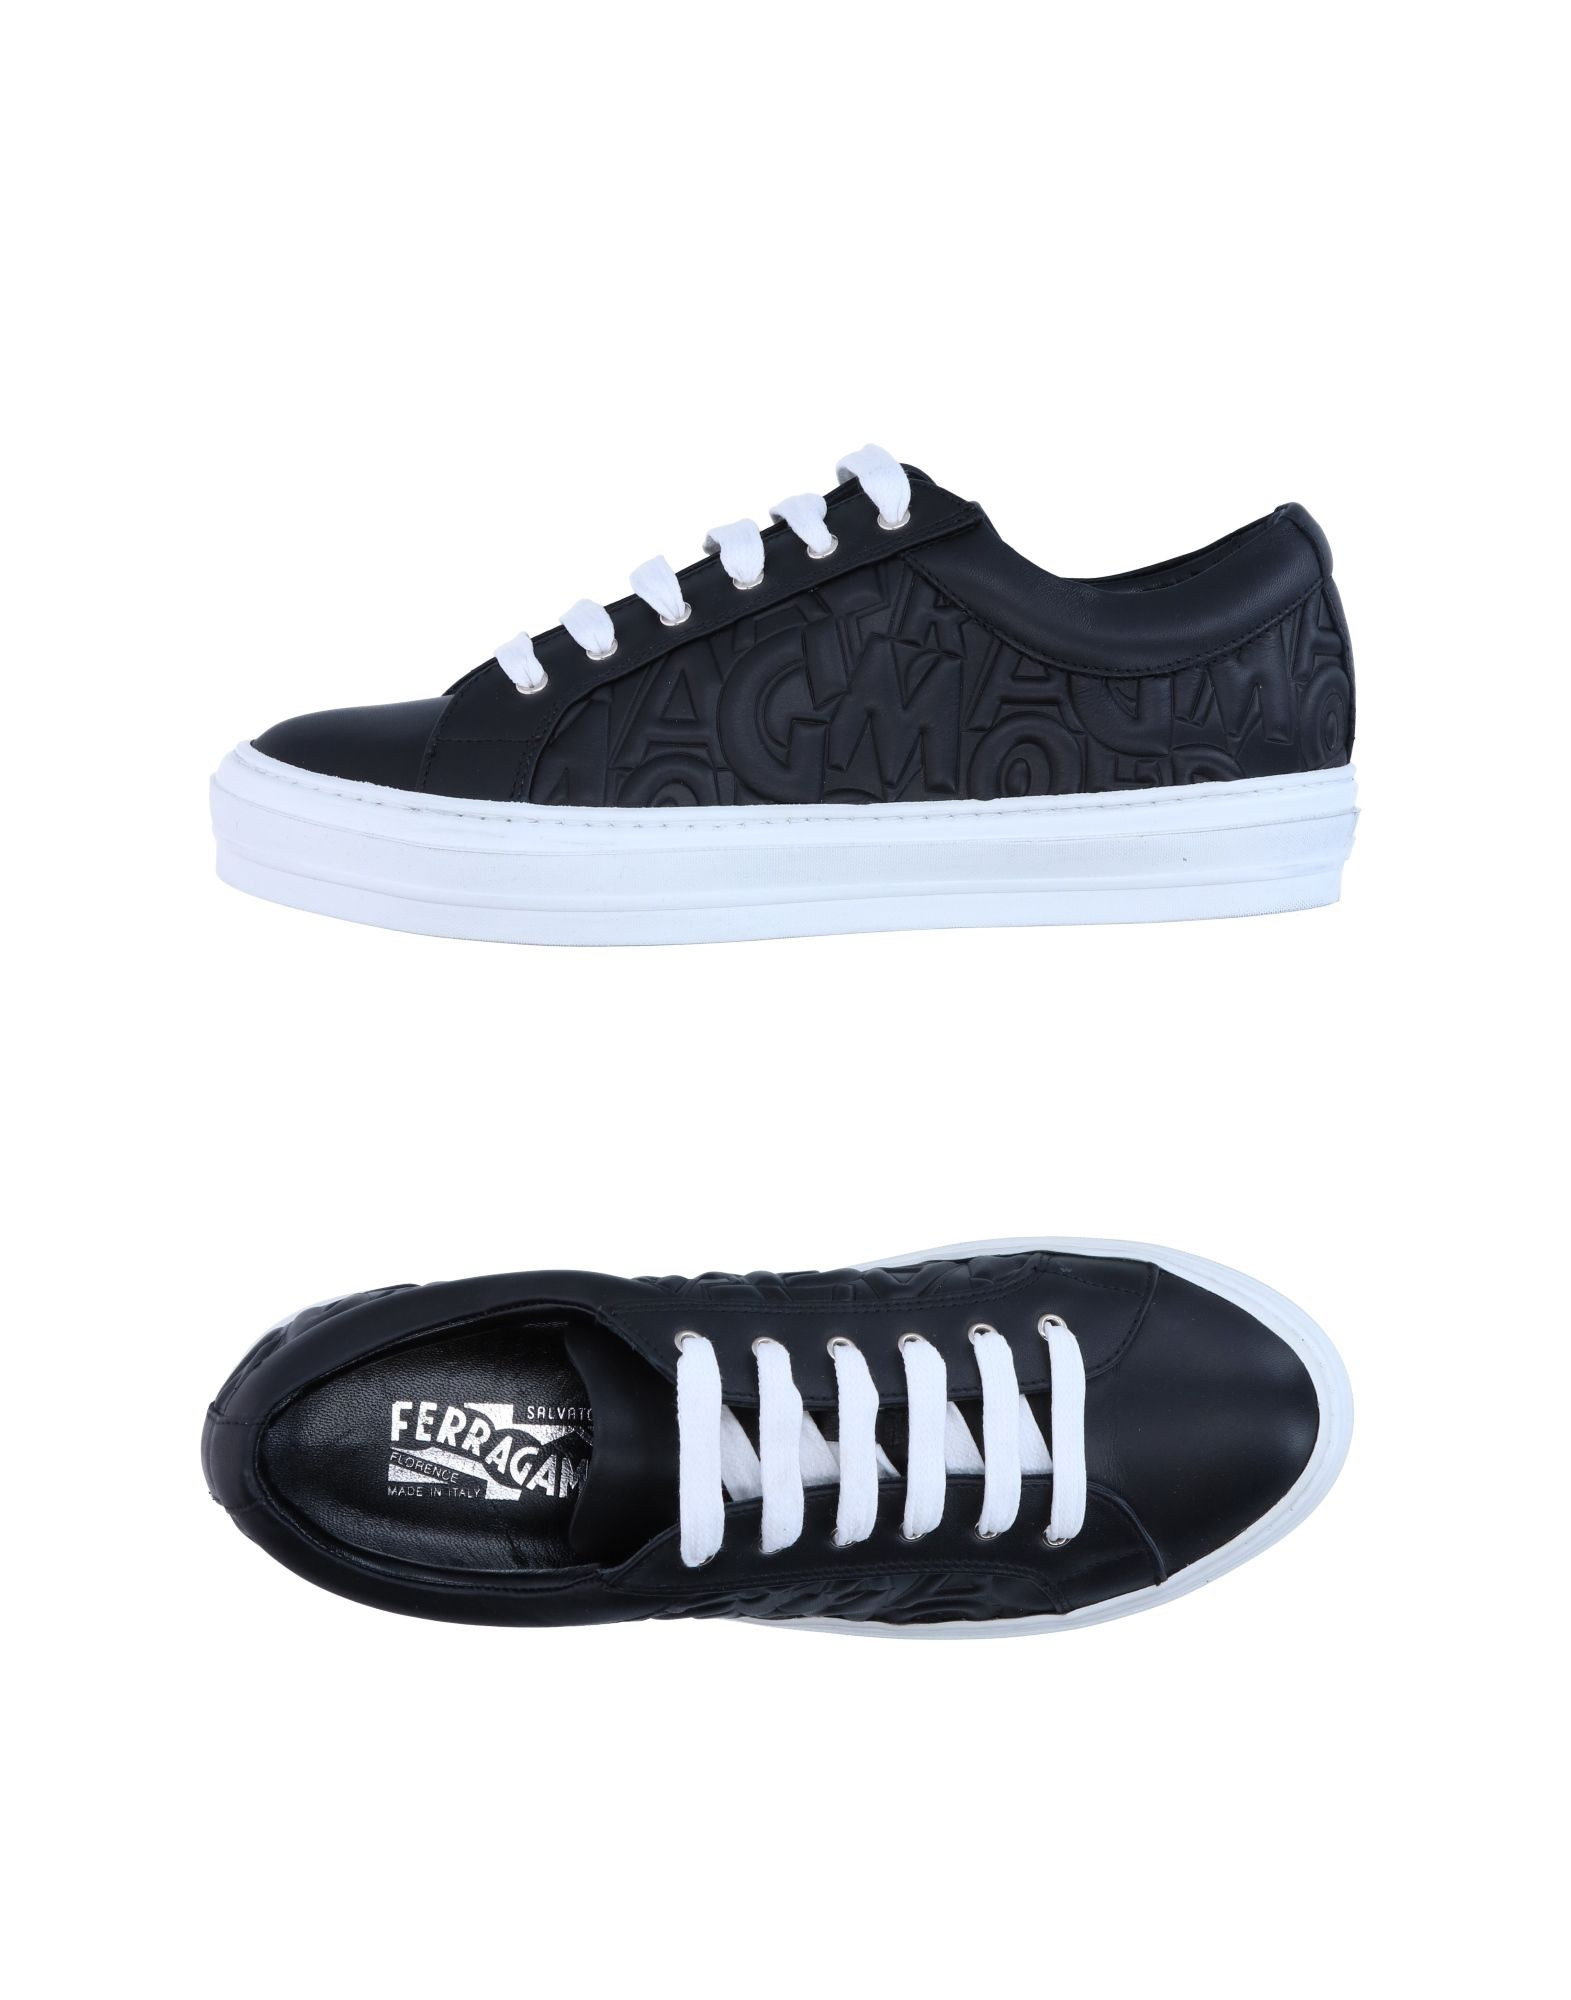 Salvatore Ferragamo Sneakers Damen  11279555VWGünstige gut aussehende Schuhe